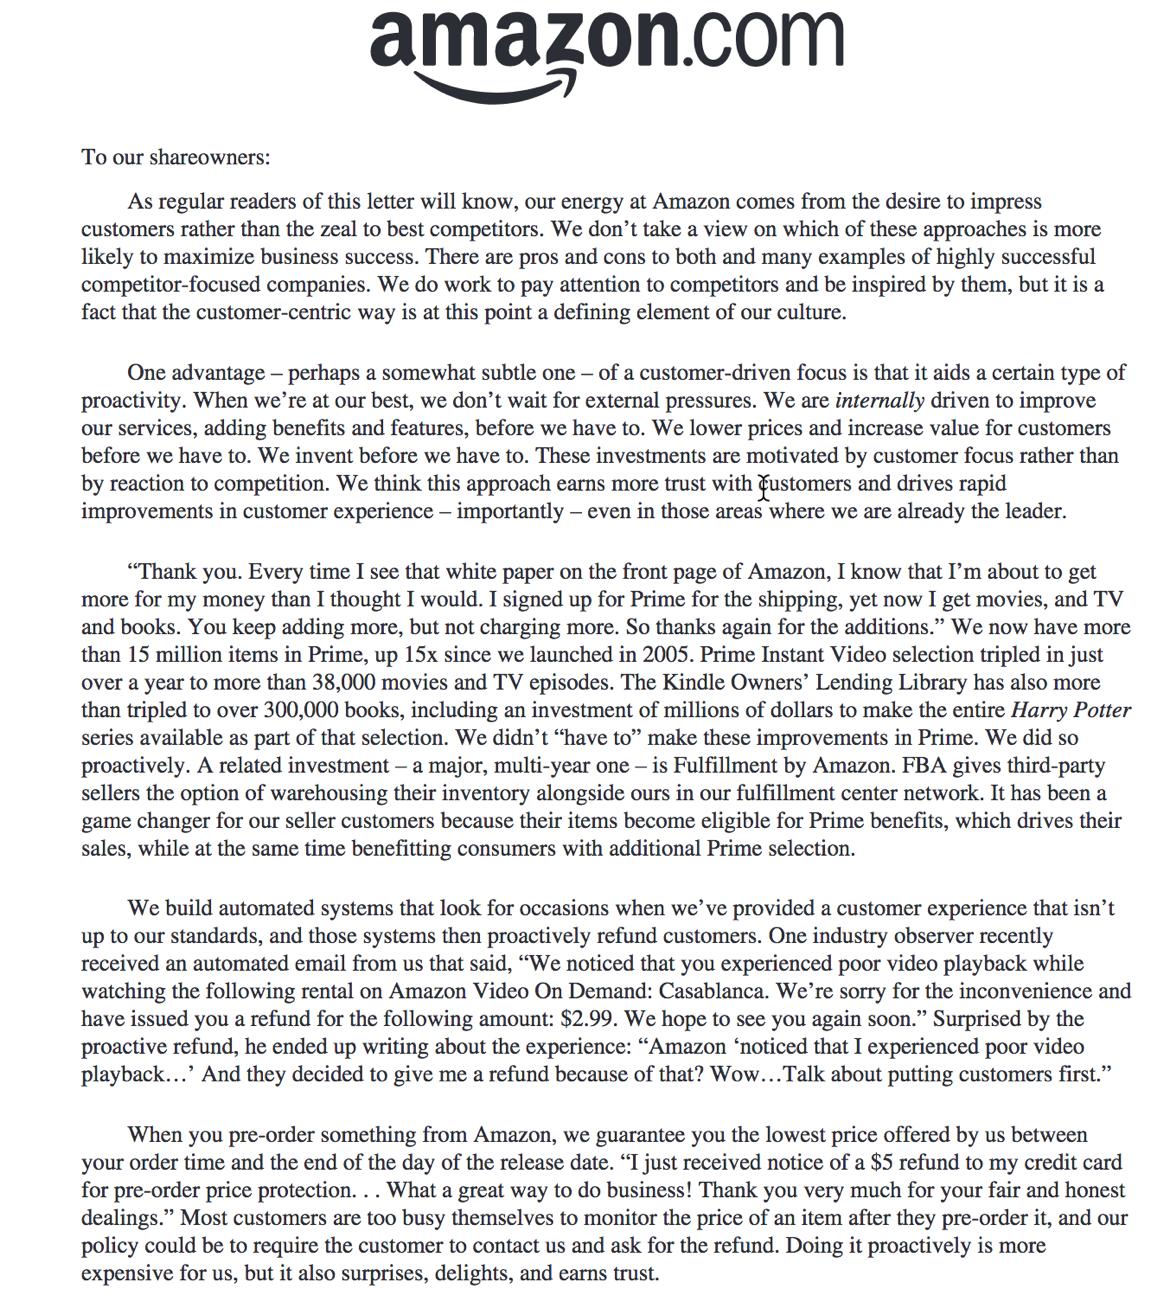 Jeff Bezos 2012 주주 서한